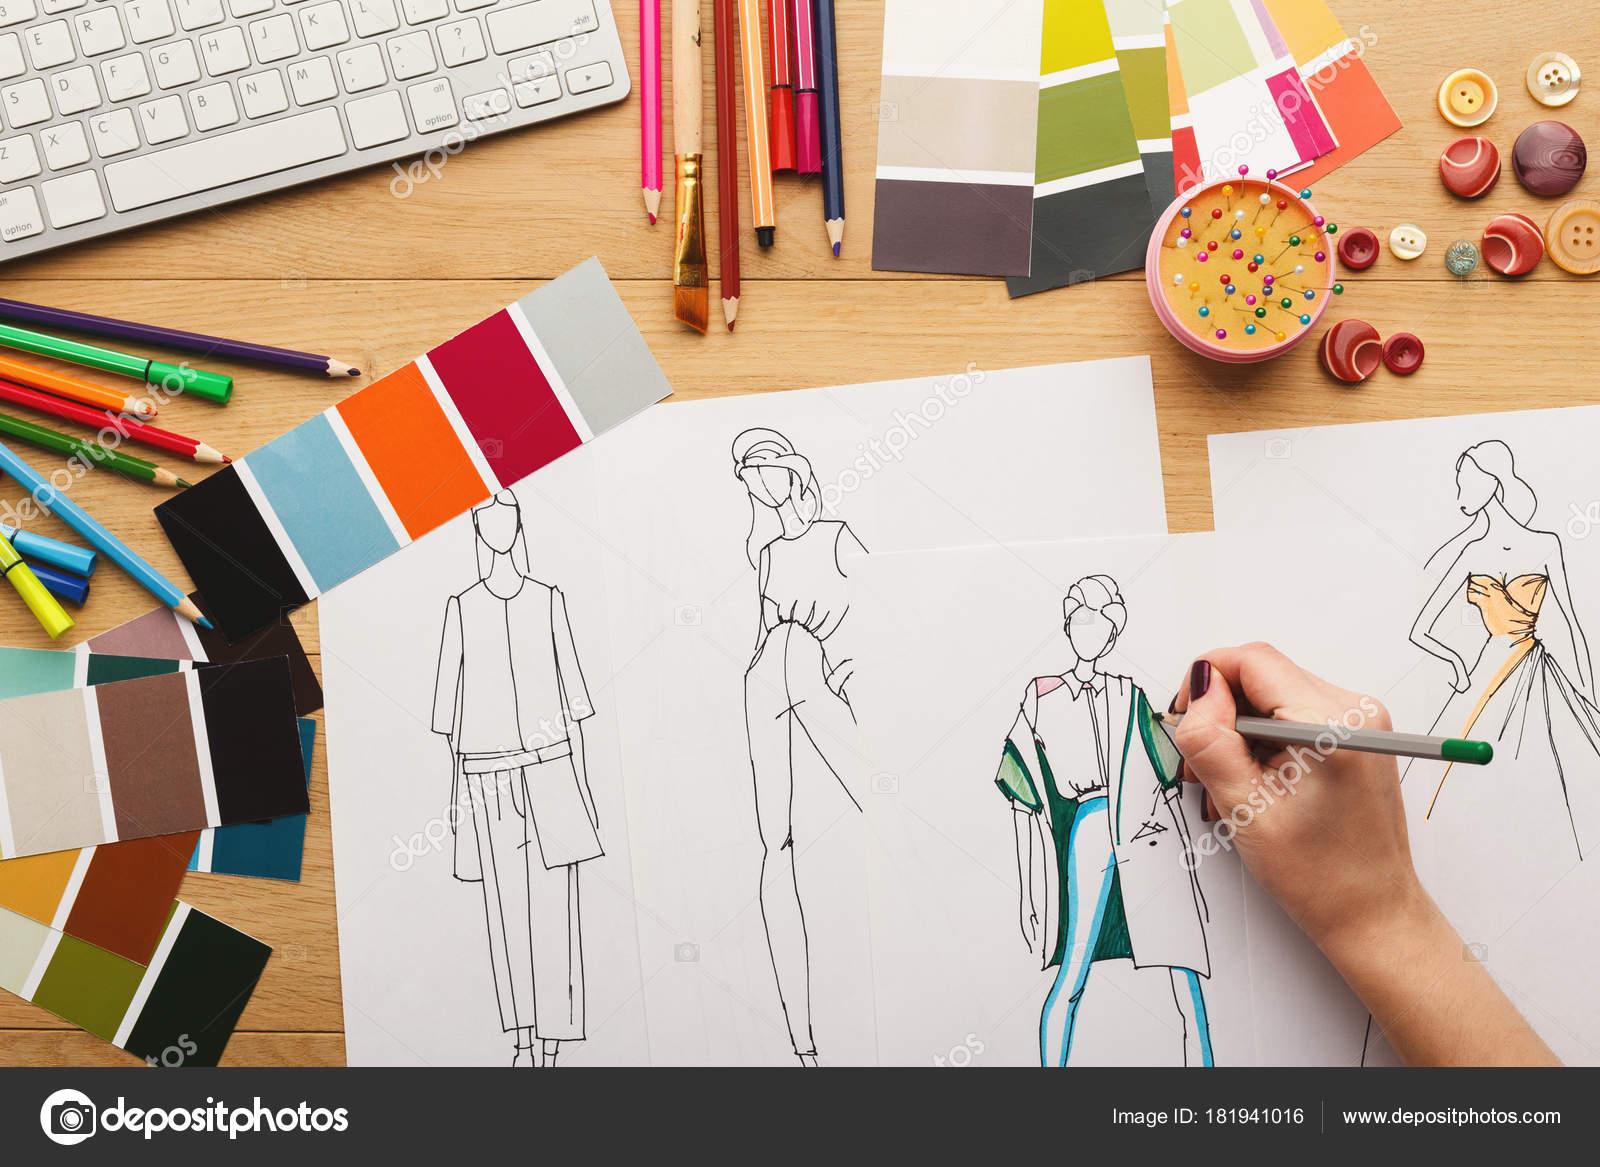 faa1d746c Crear diseños de ropa | Vista superior sobre bocetos de ropa dibujo ...